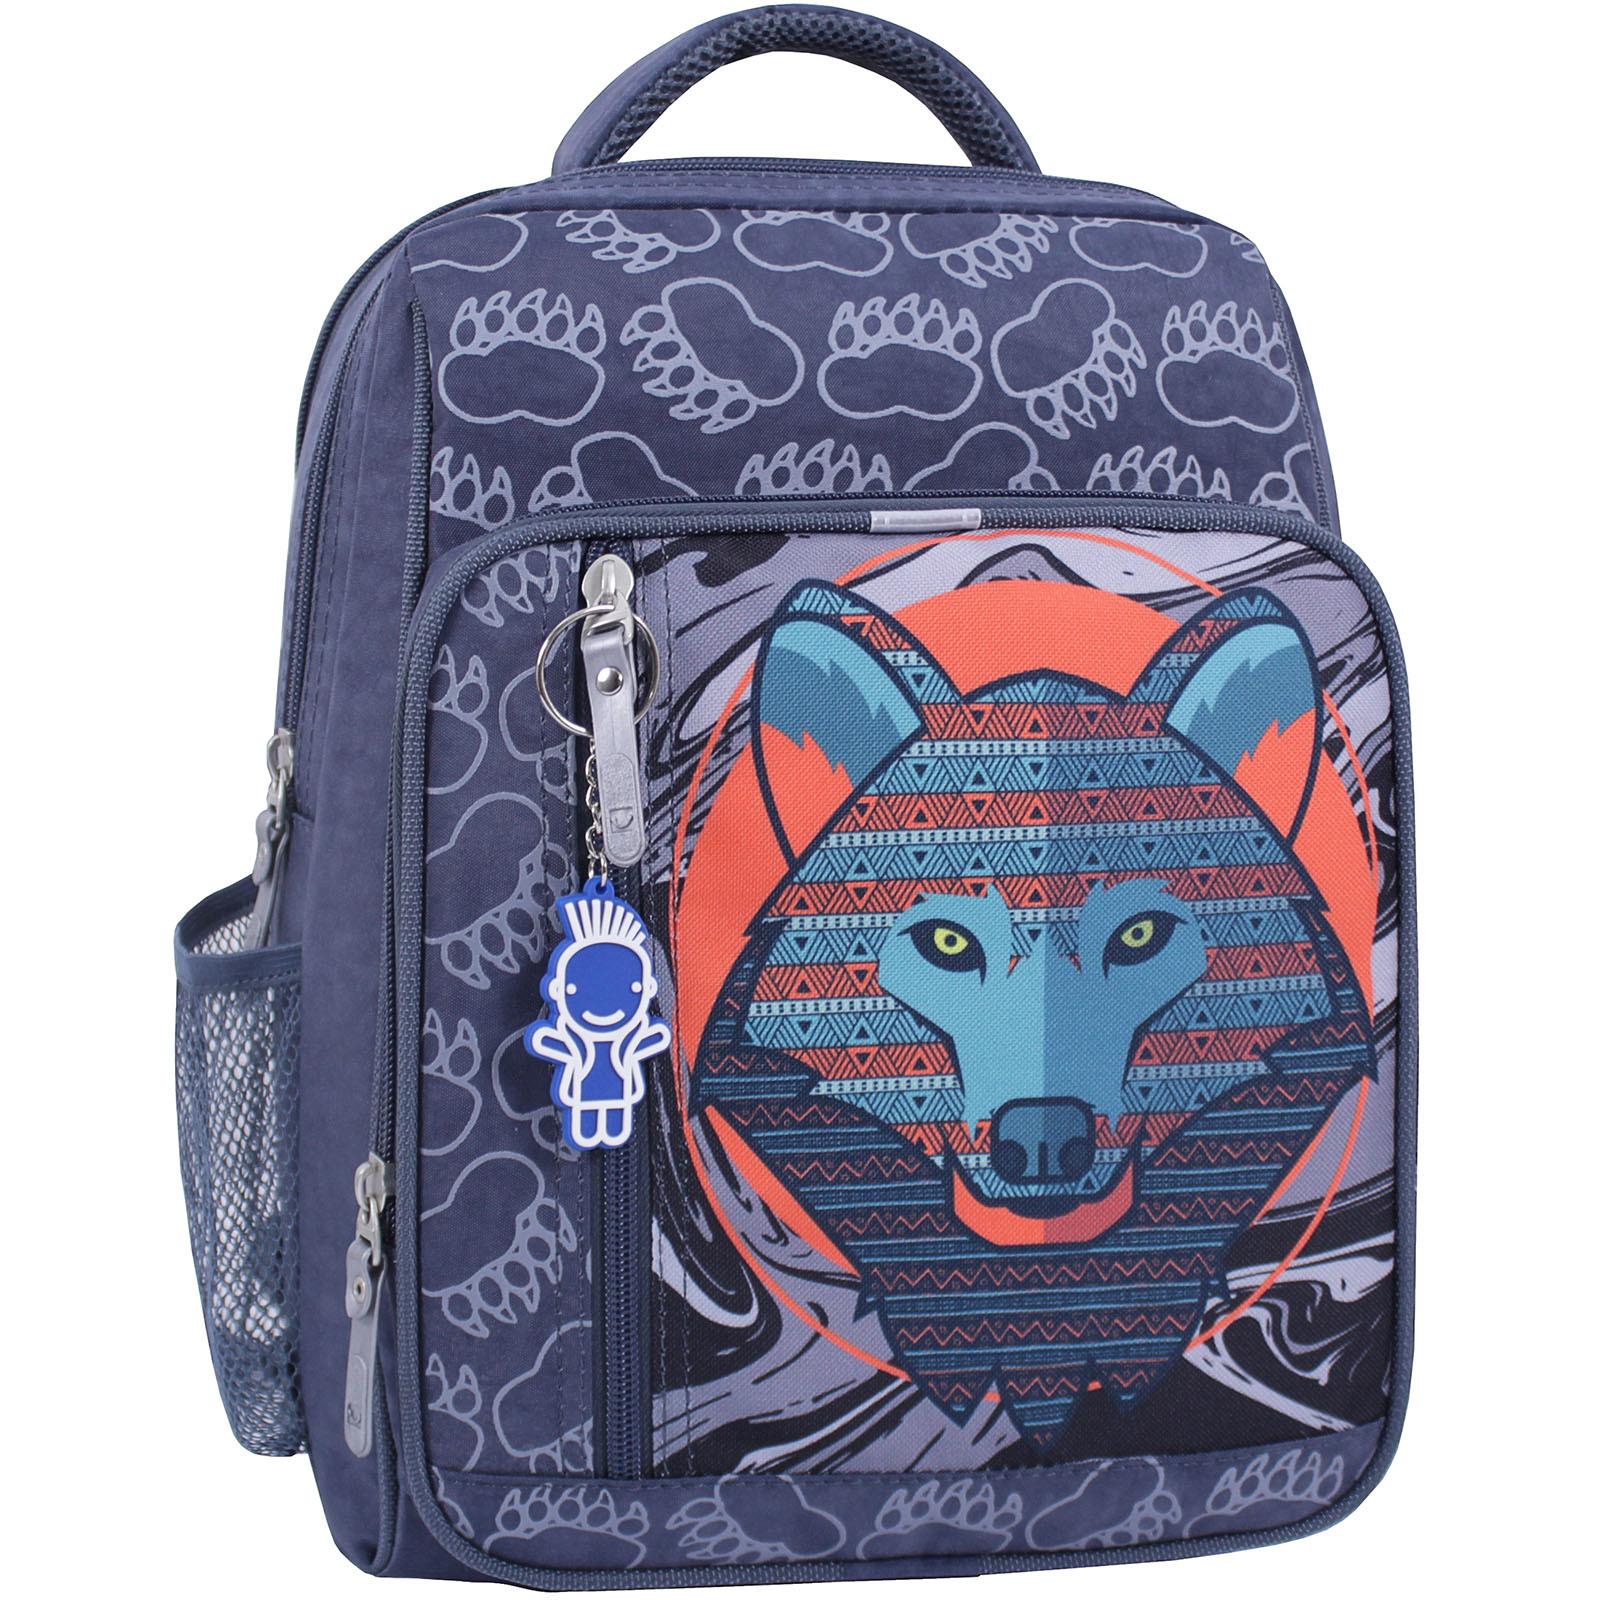 Школьные рюкзаки Рюкзак школьный Bagland Школьник 8 л. 321 серый 509 (0012870) IMG_0949_суб.509_.JPG